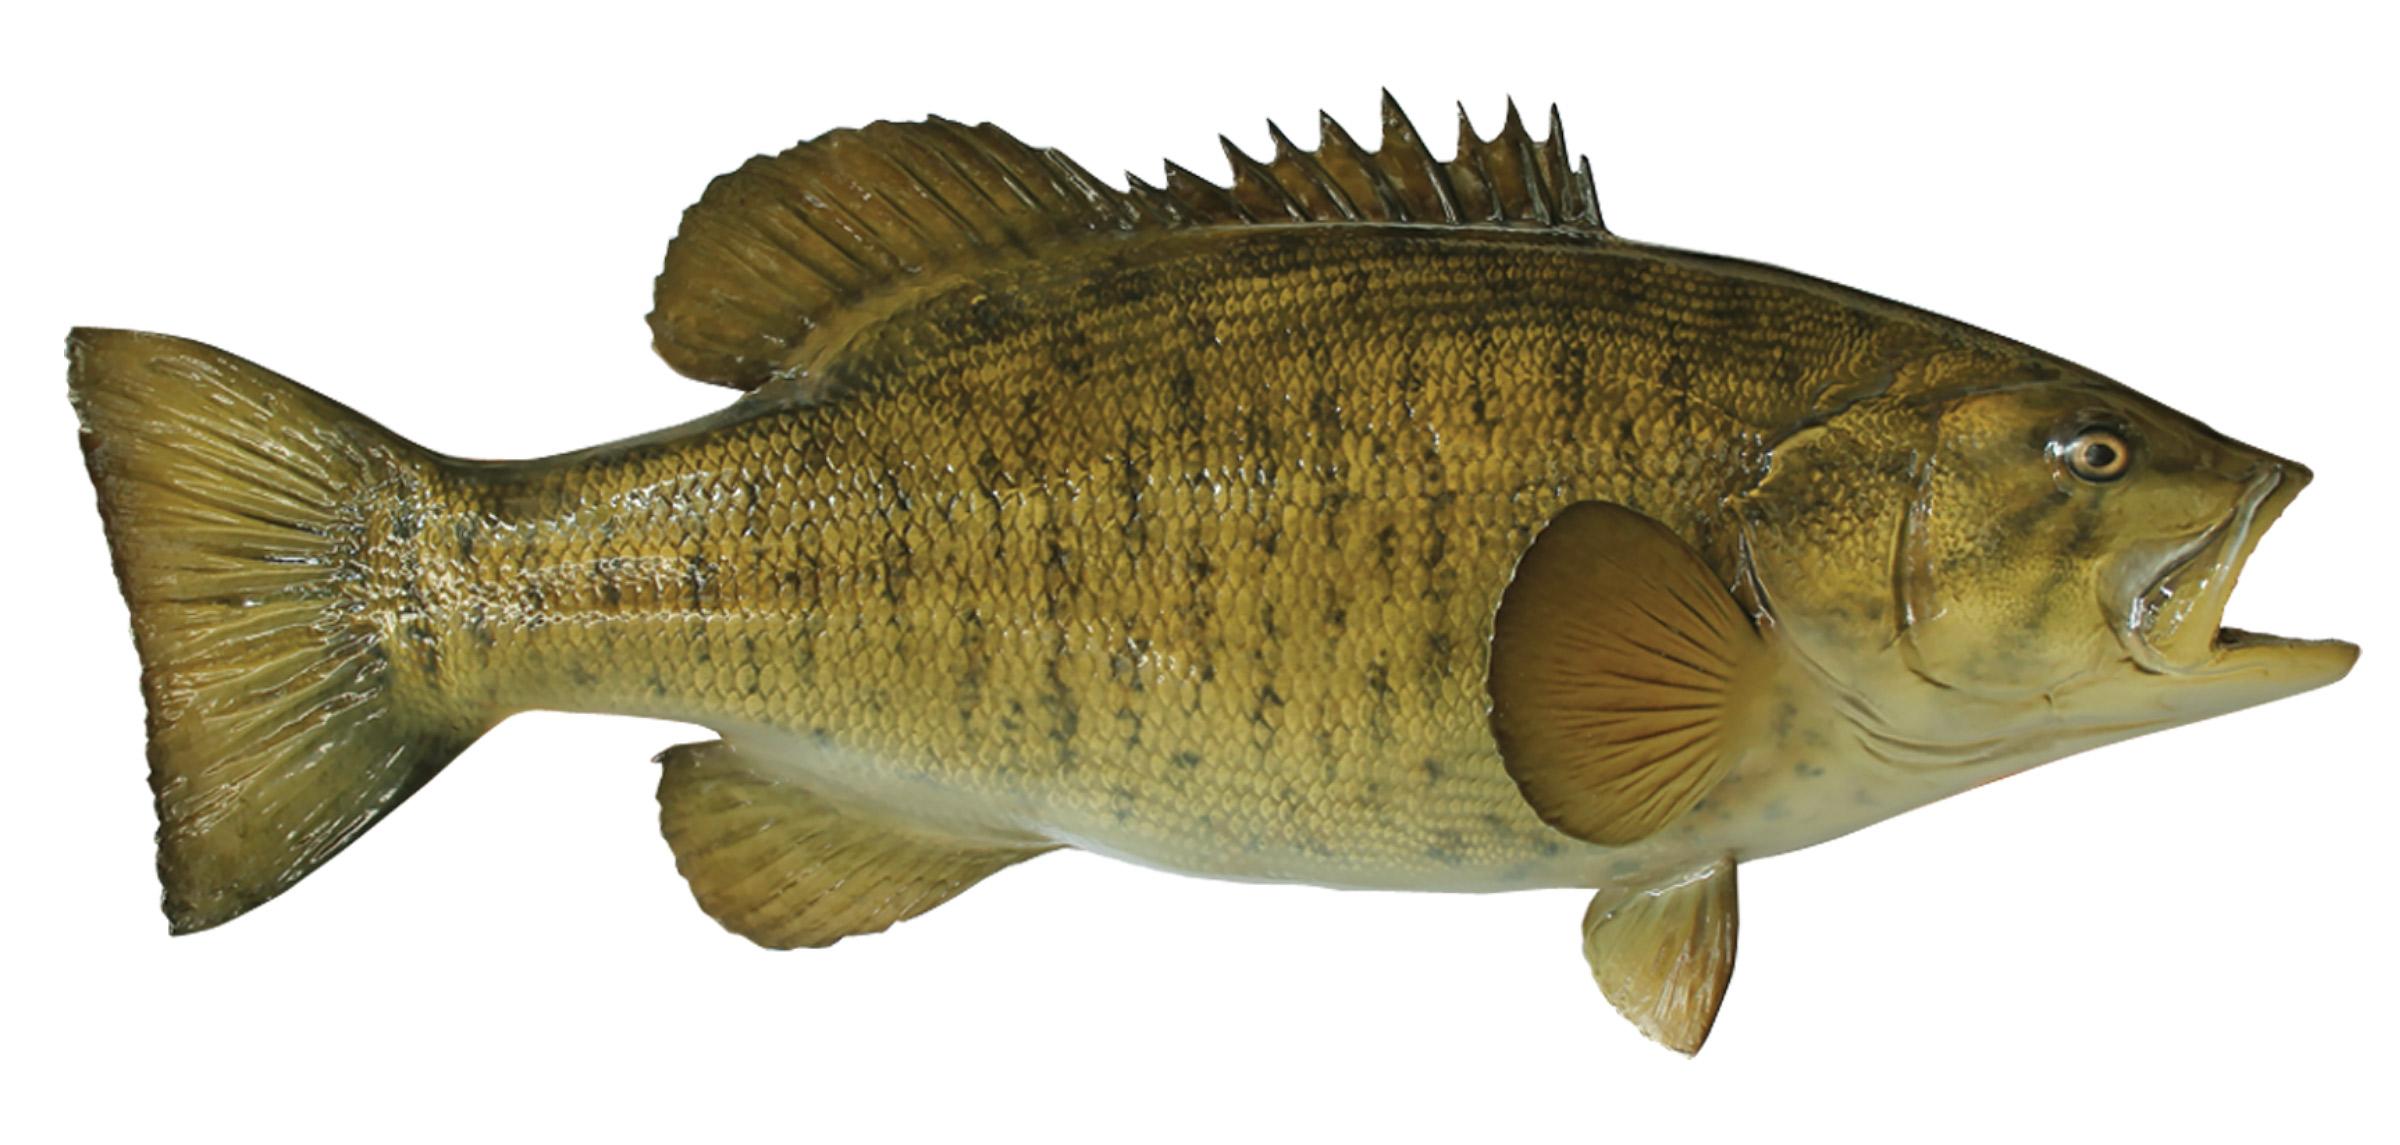 Small mouth Bass Fish ...